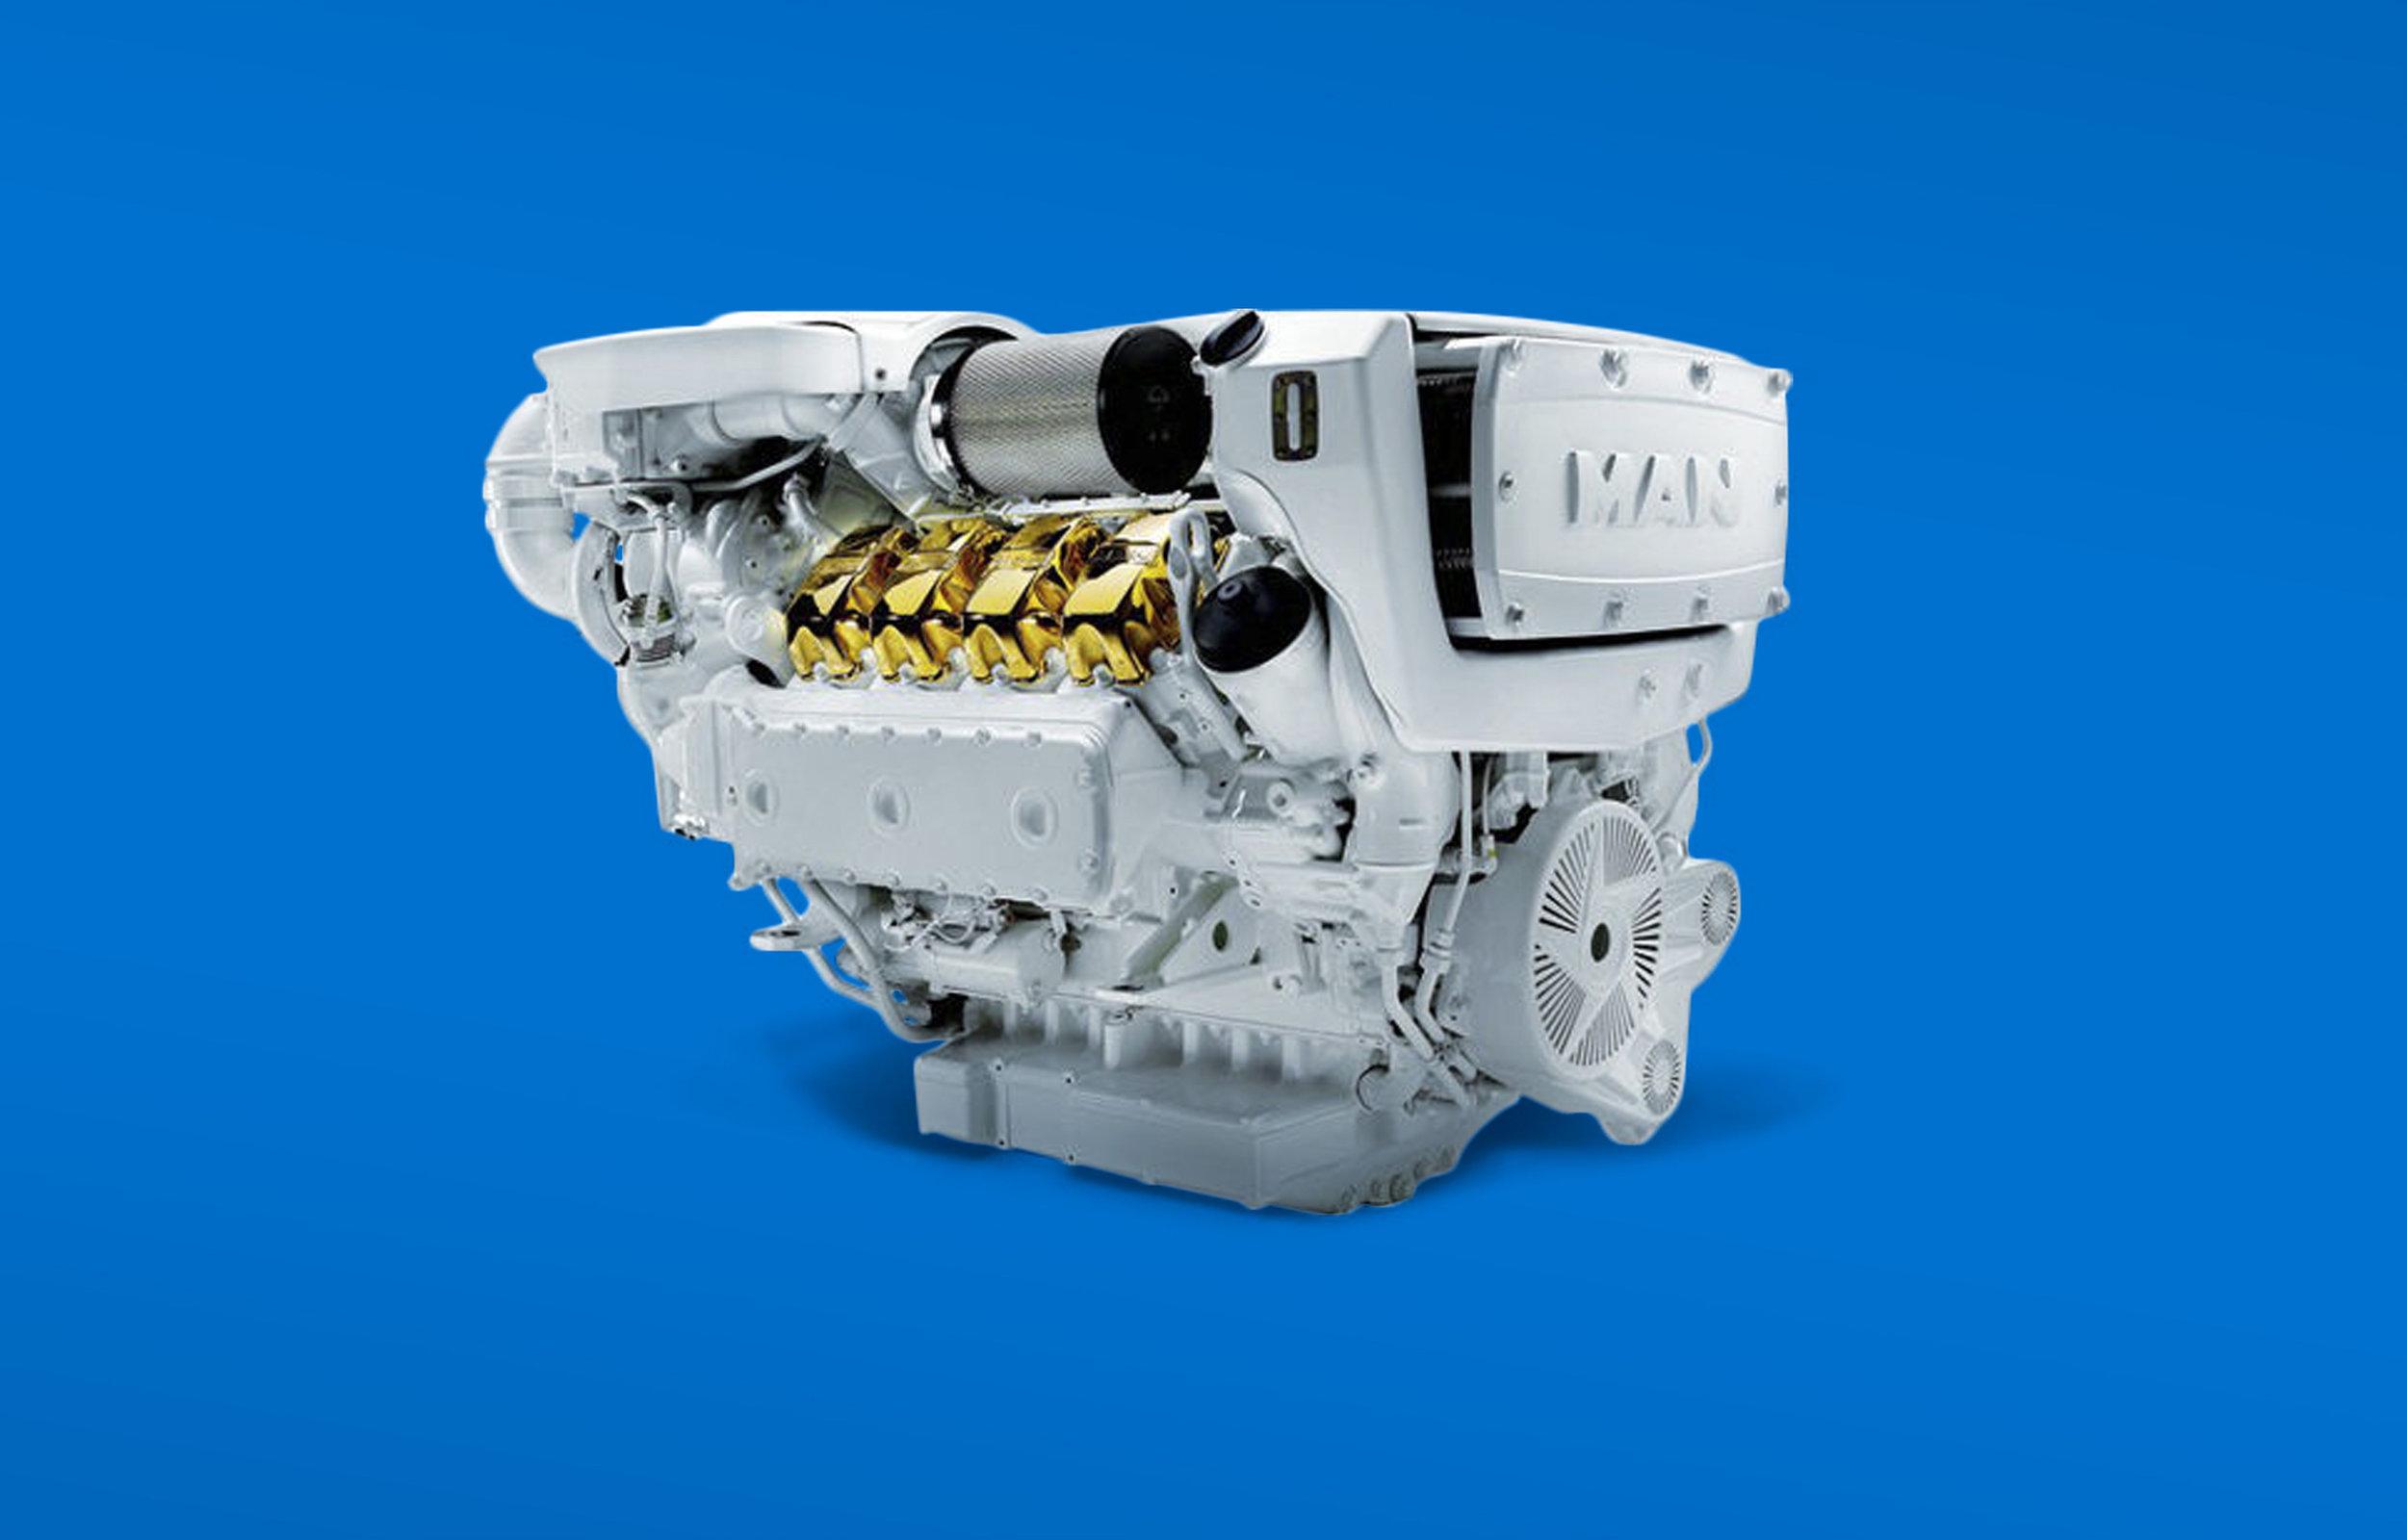 Copy of MAN V8 ENGINES